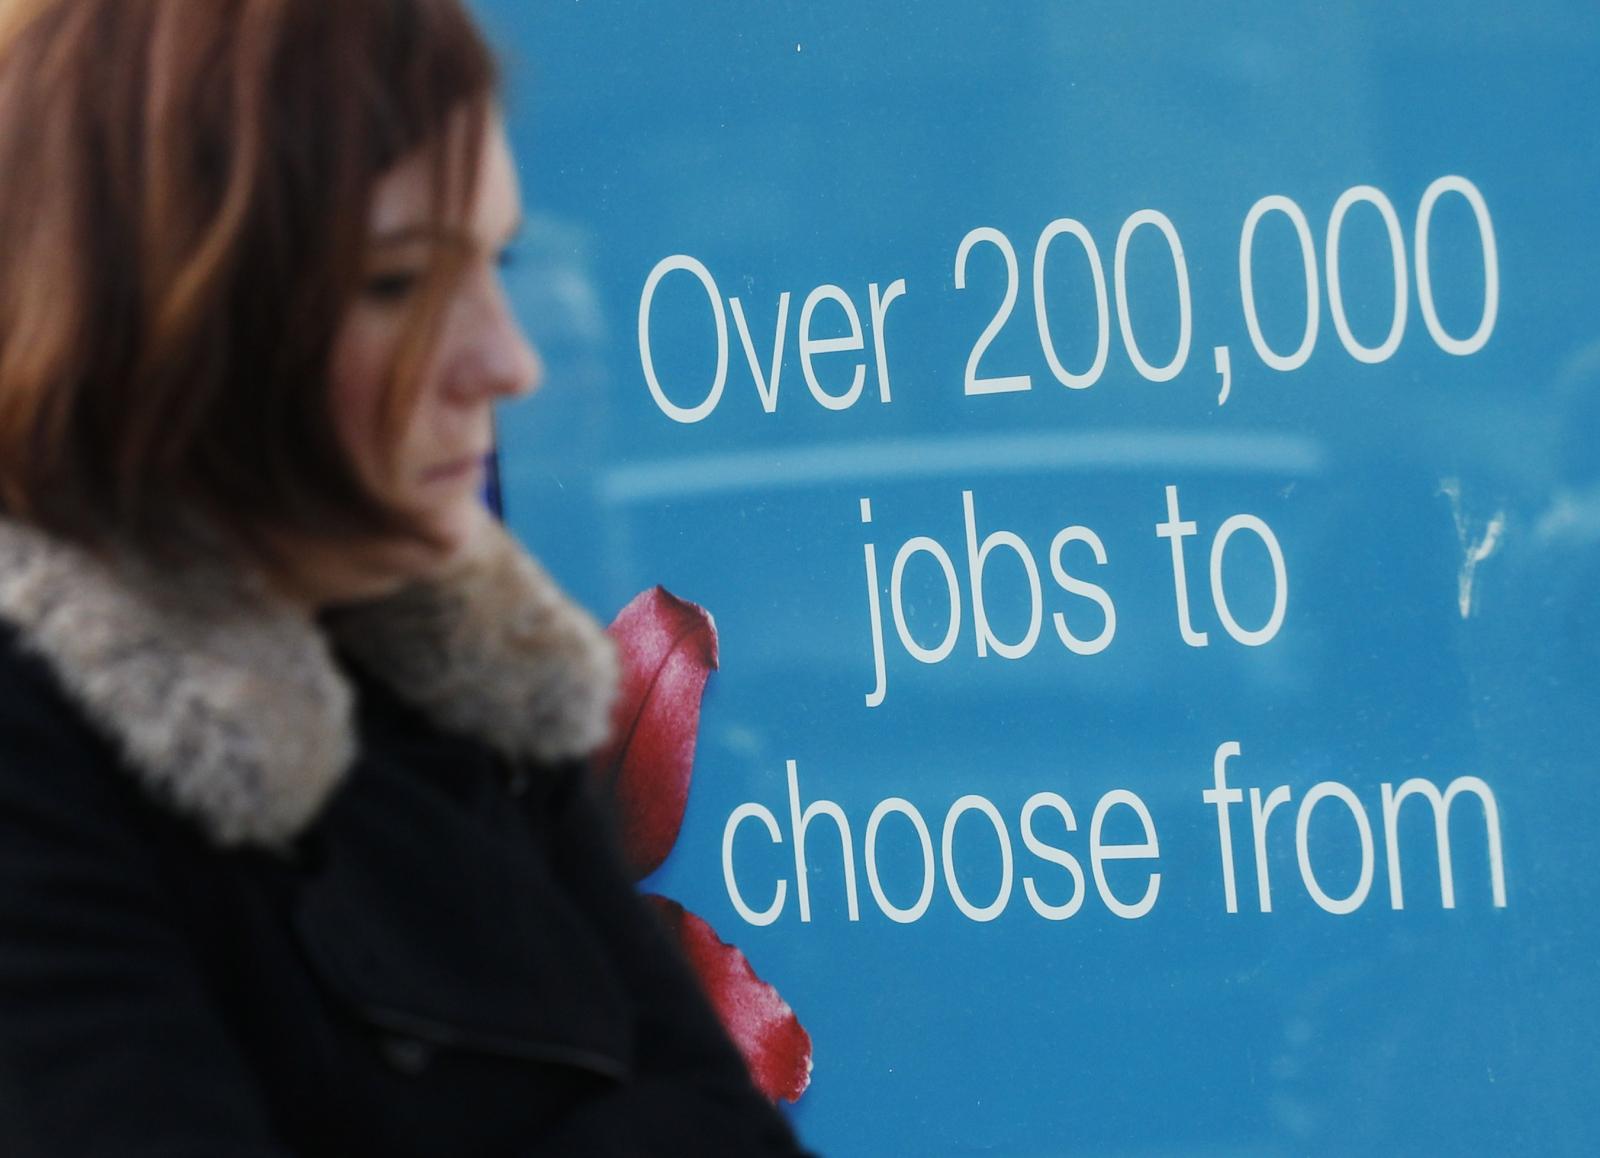 UK job board